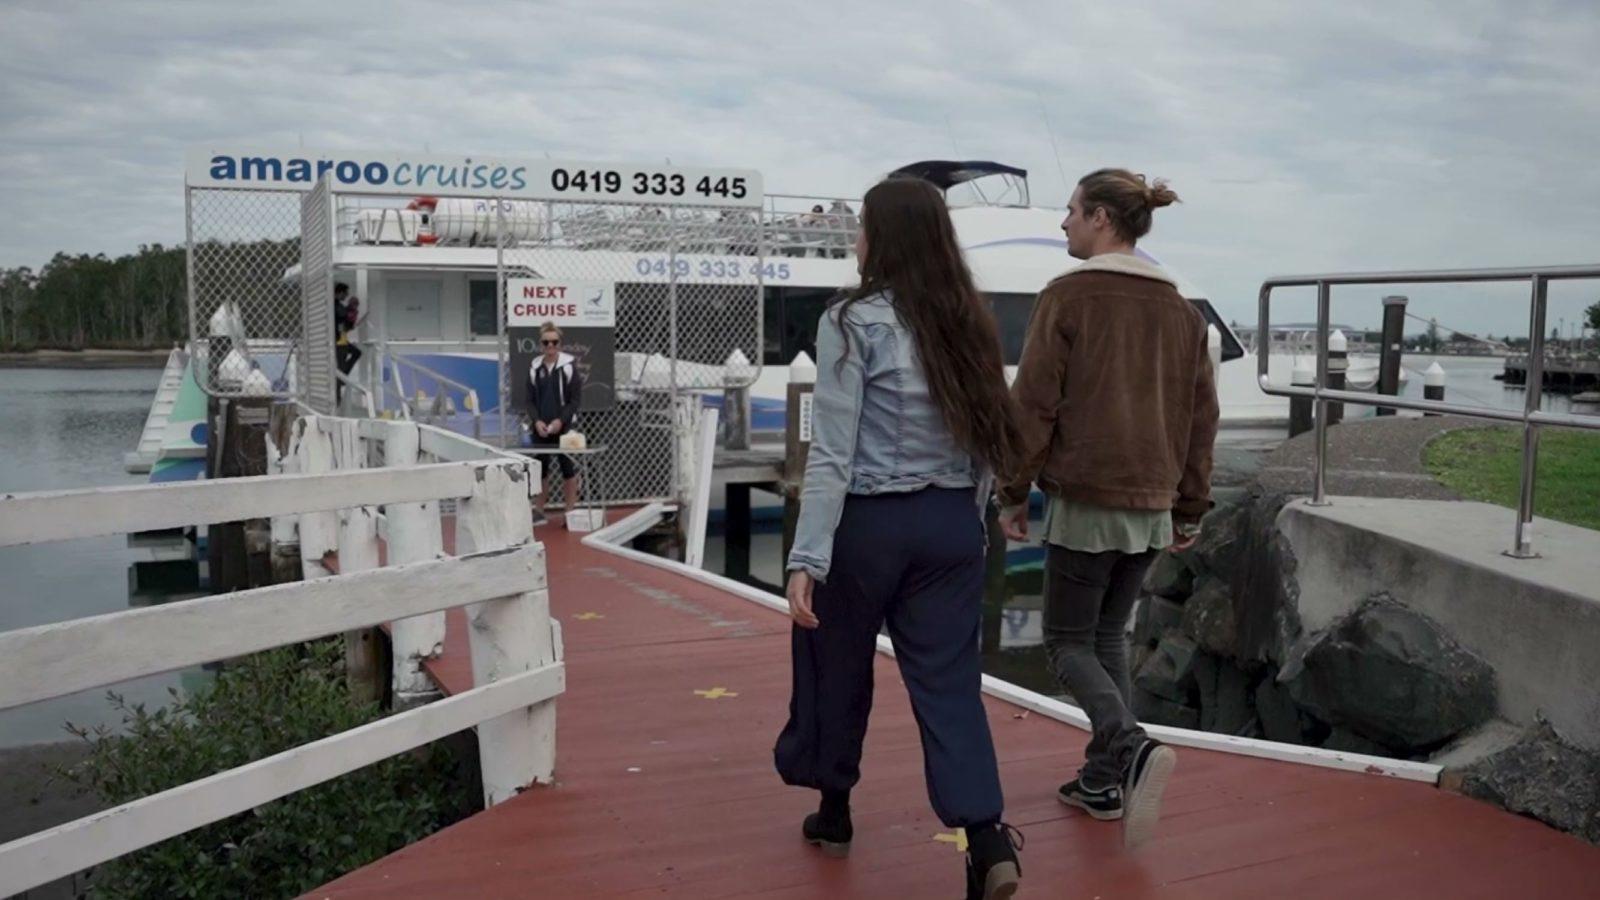 Amaroo Cruises dock